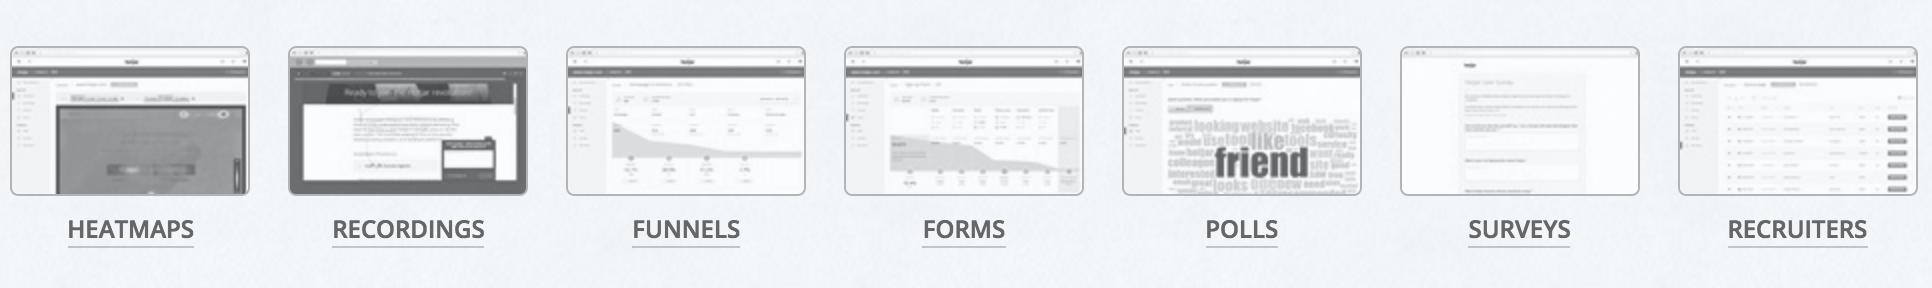 Hot Jar Analytics Screens